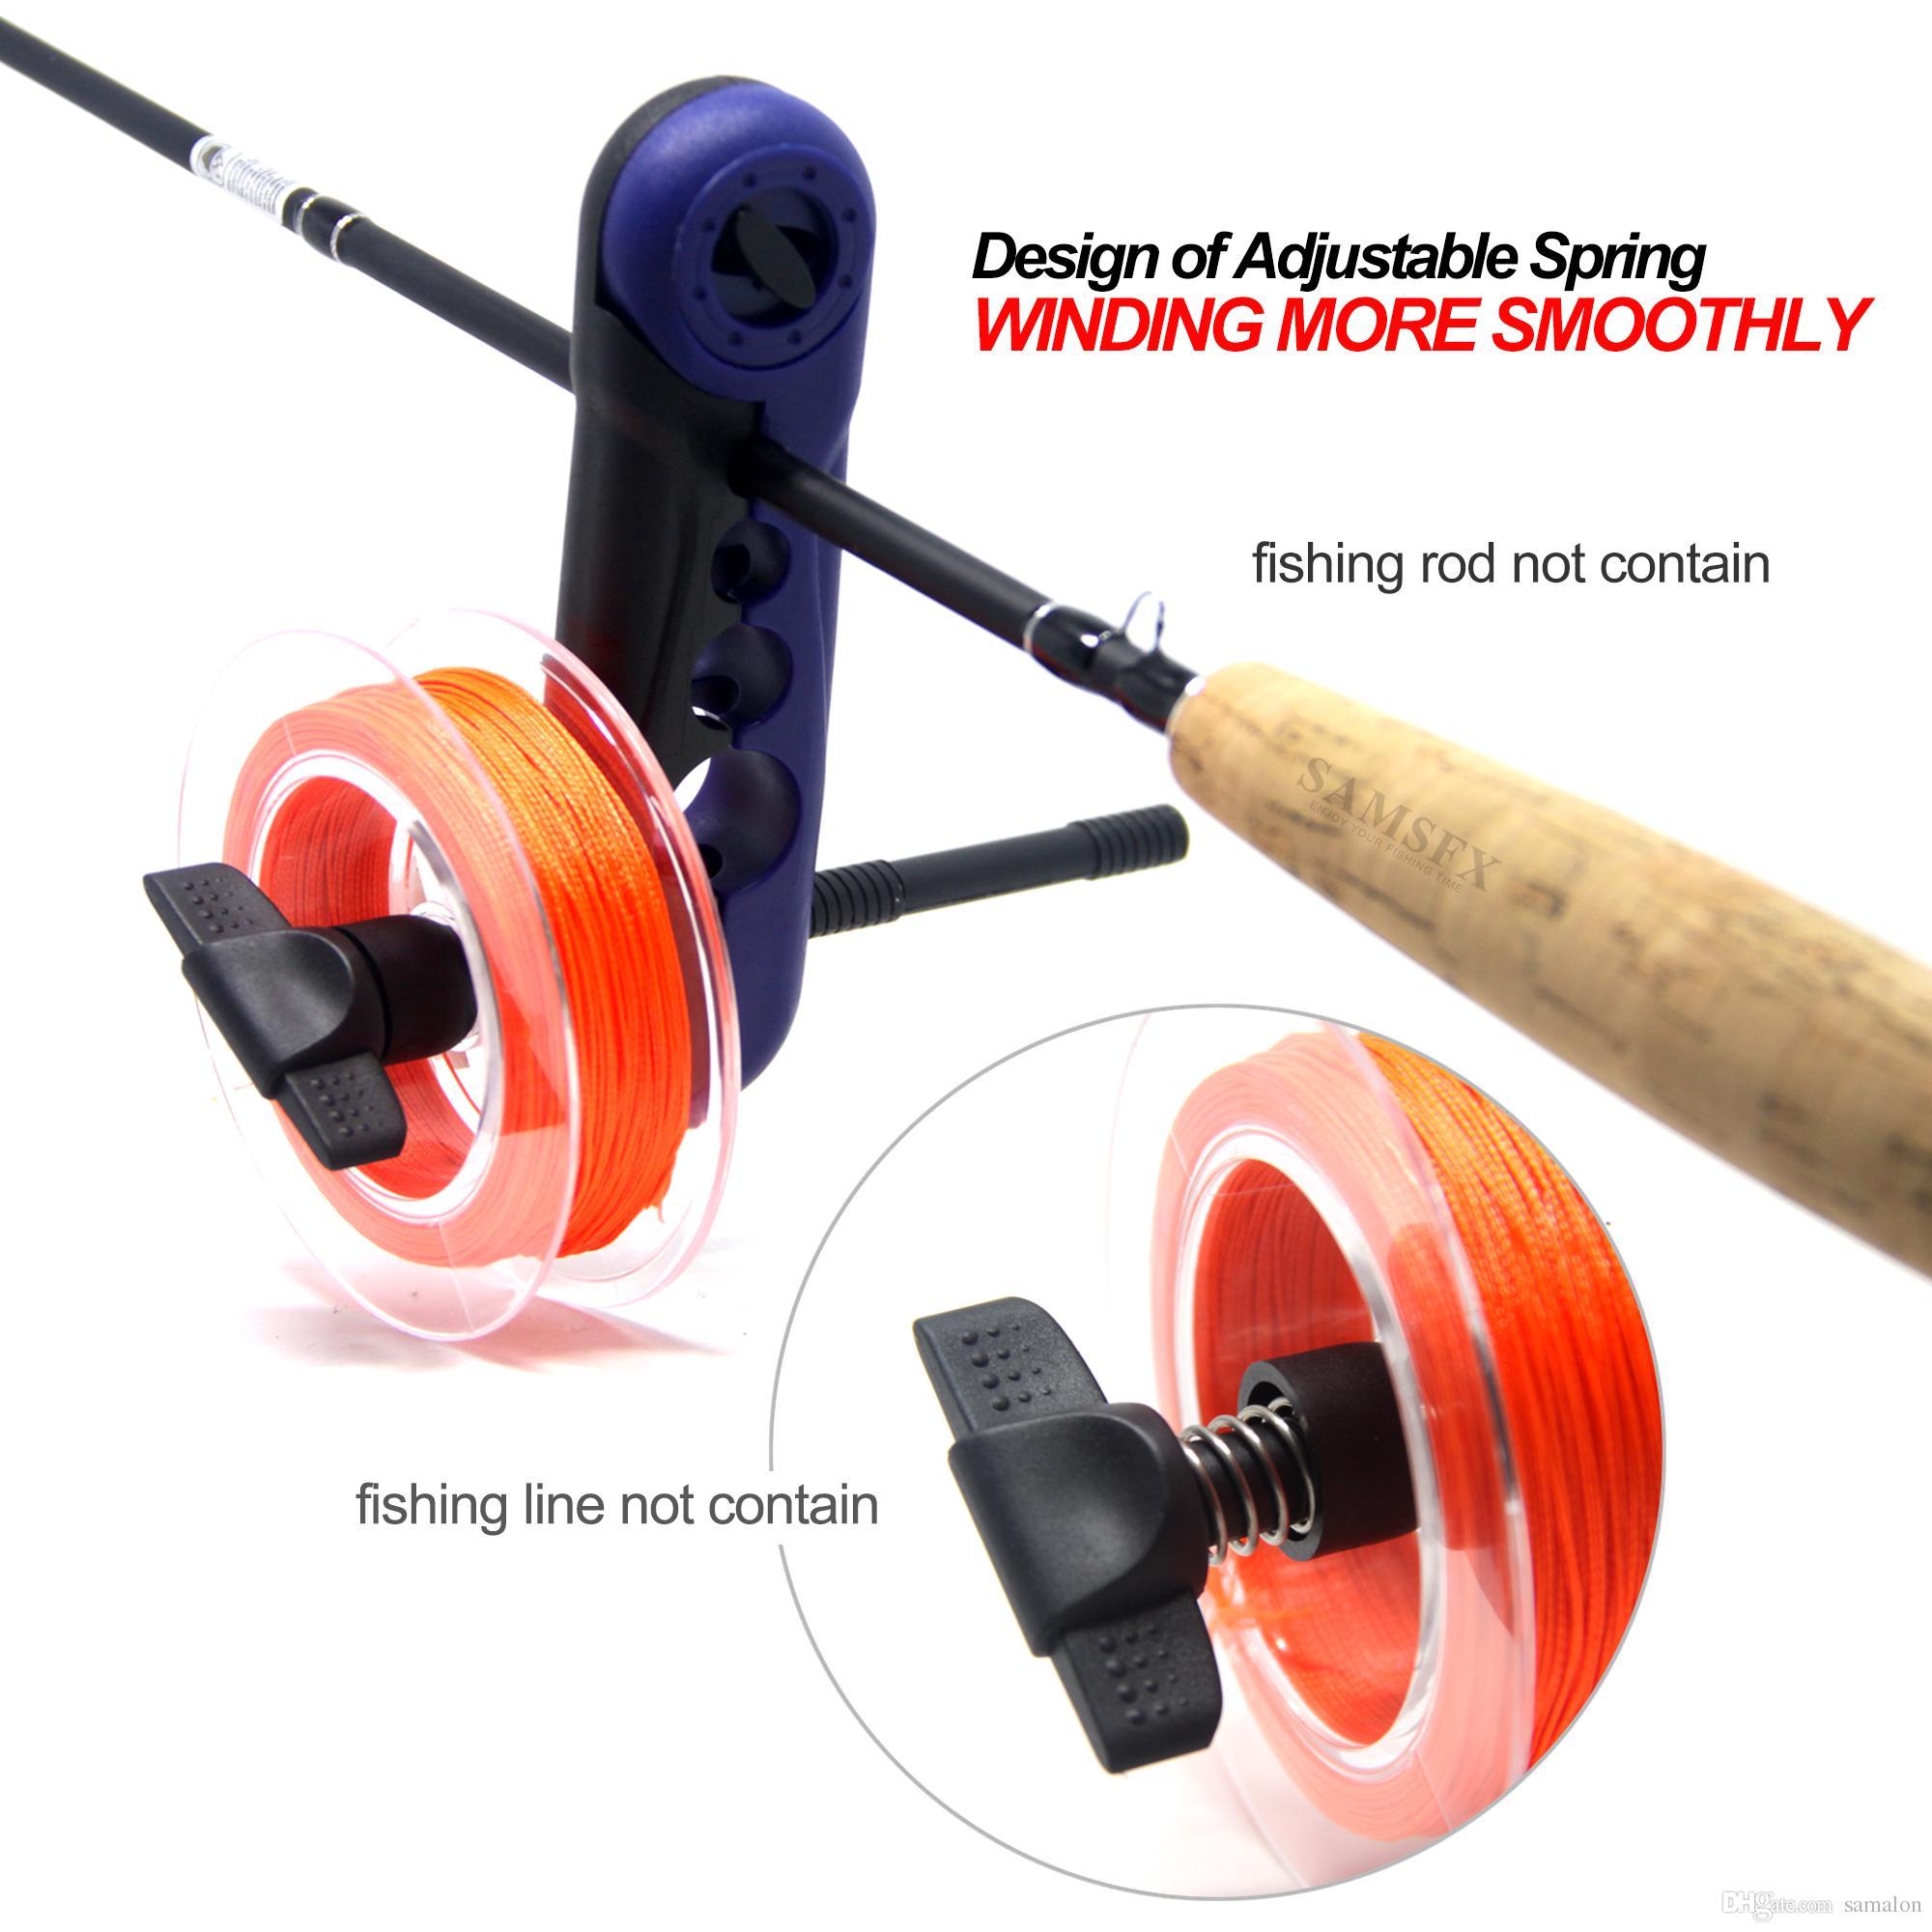 SAMSFX Portable Mini Universal Fishing Reel Line Spooler Spooler System работает с клипами на любом стержне размера